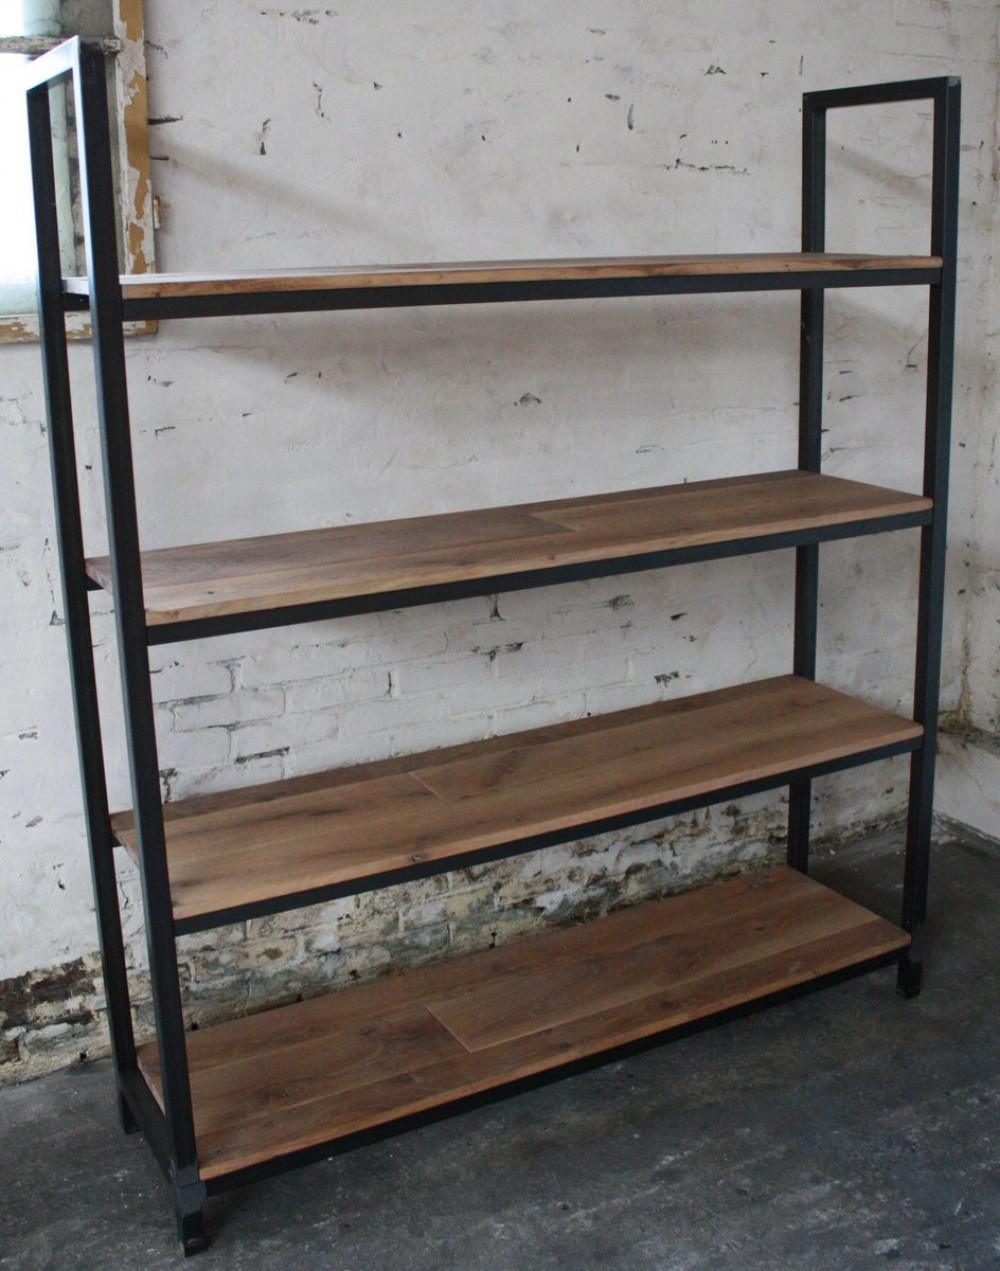 b cherregal aus eichenholz stahl schwarz. Black Bedroom Furniture Sets. Home Design Ideas